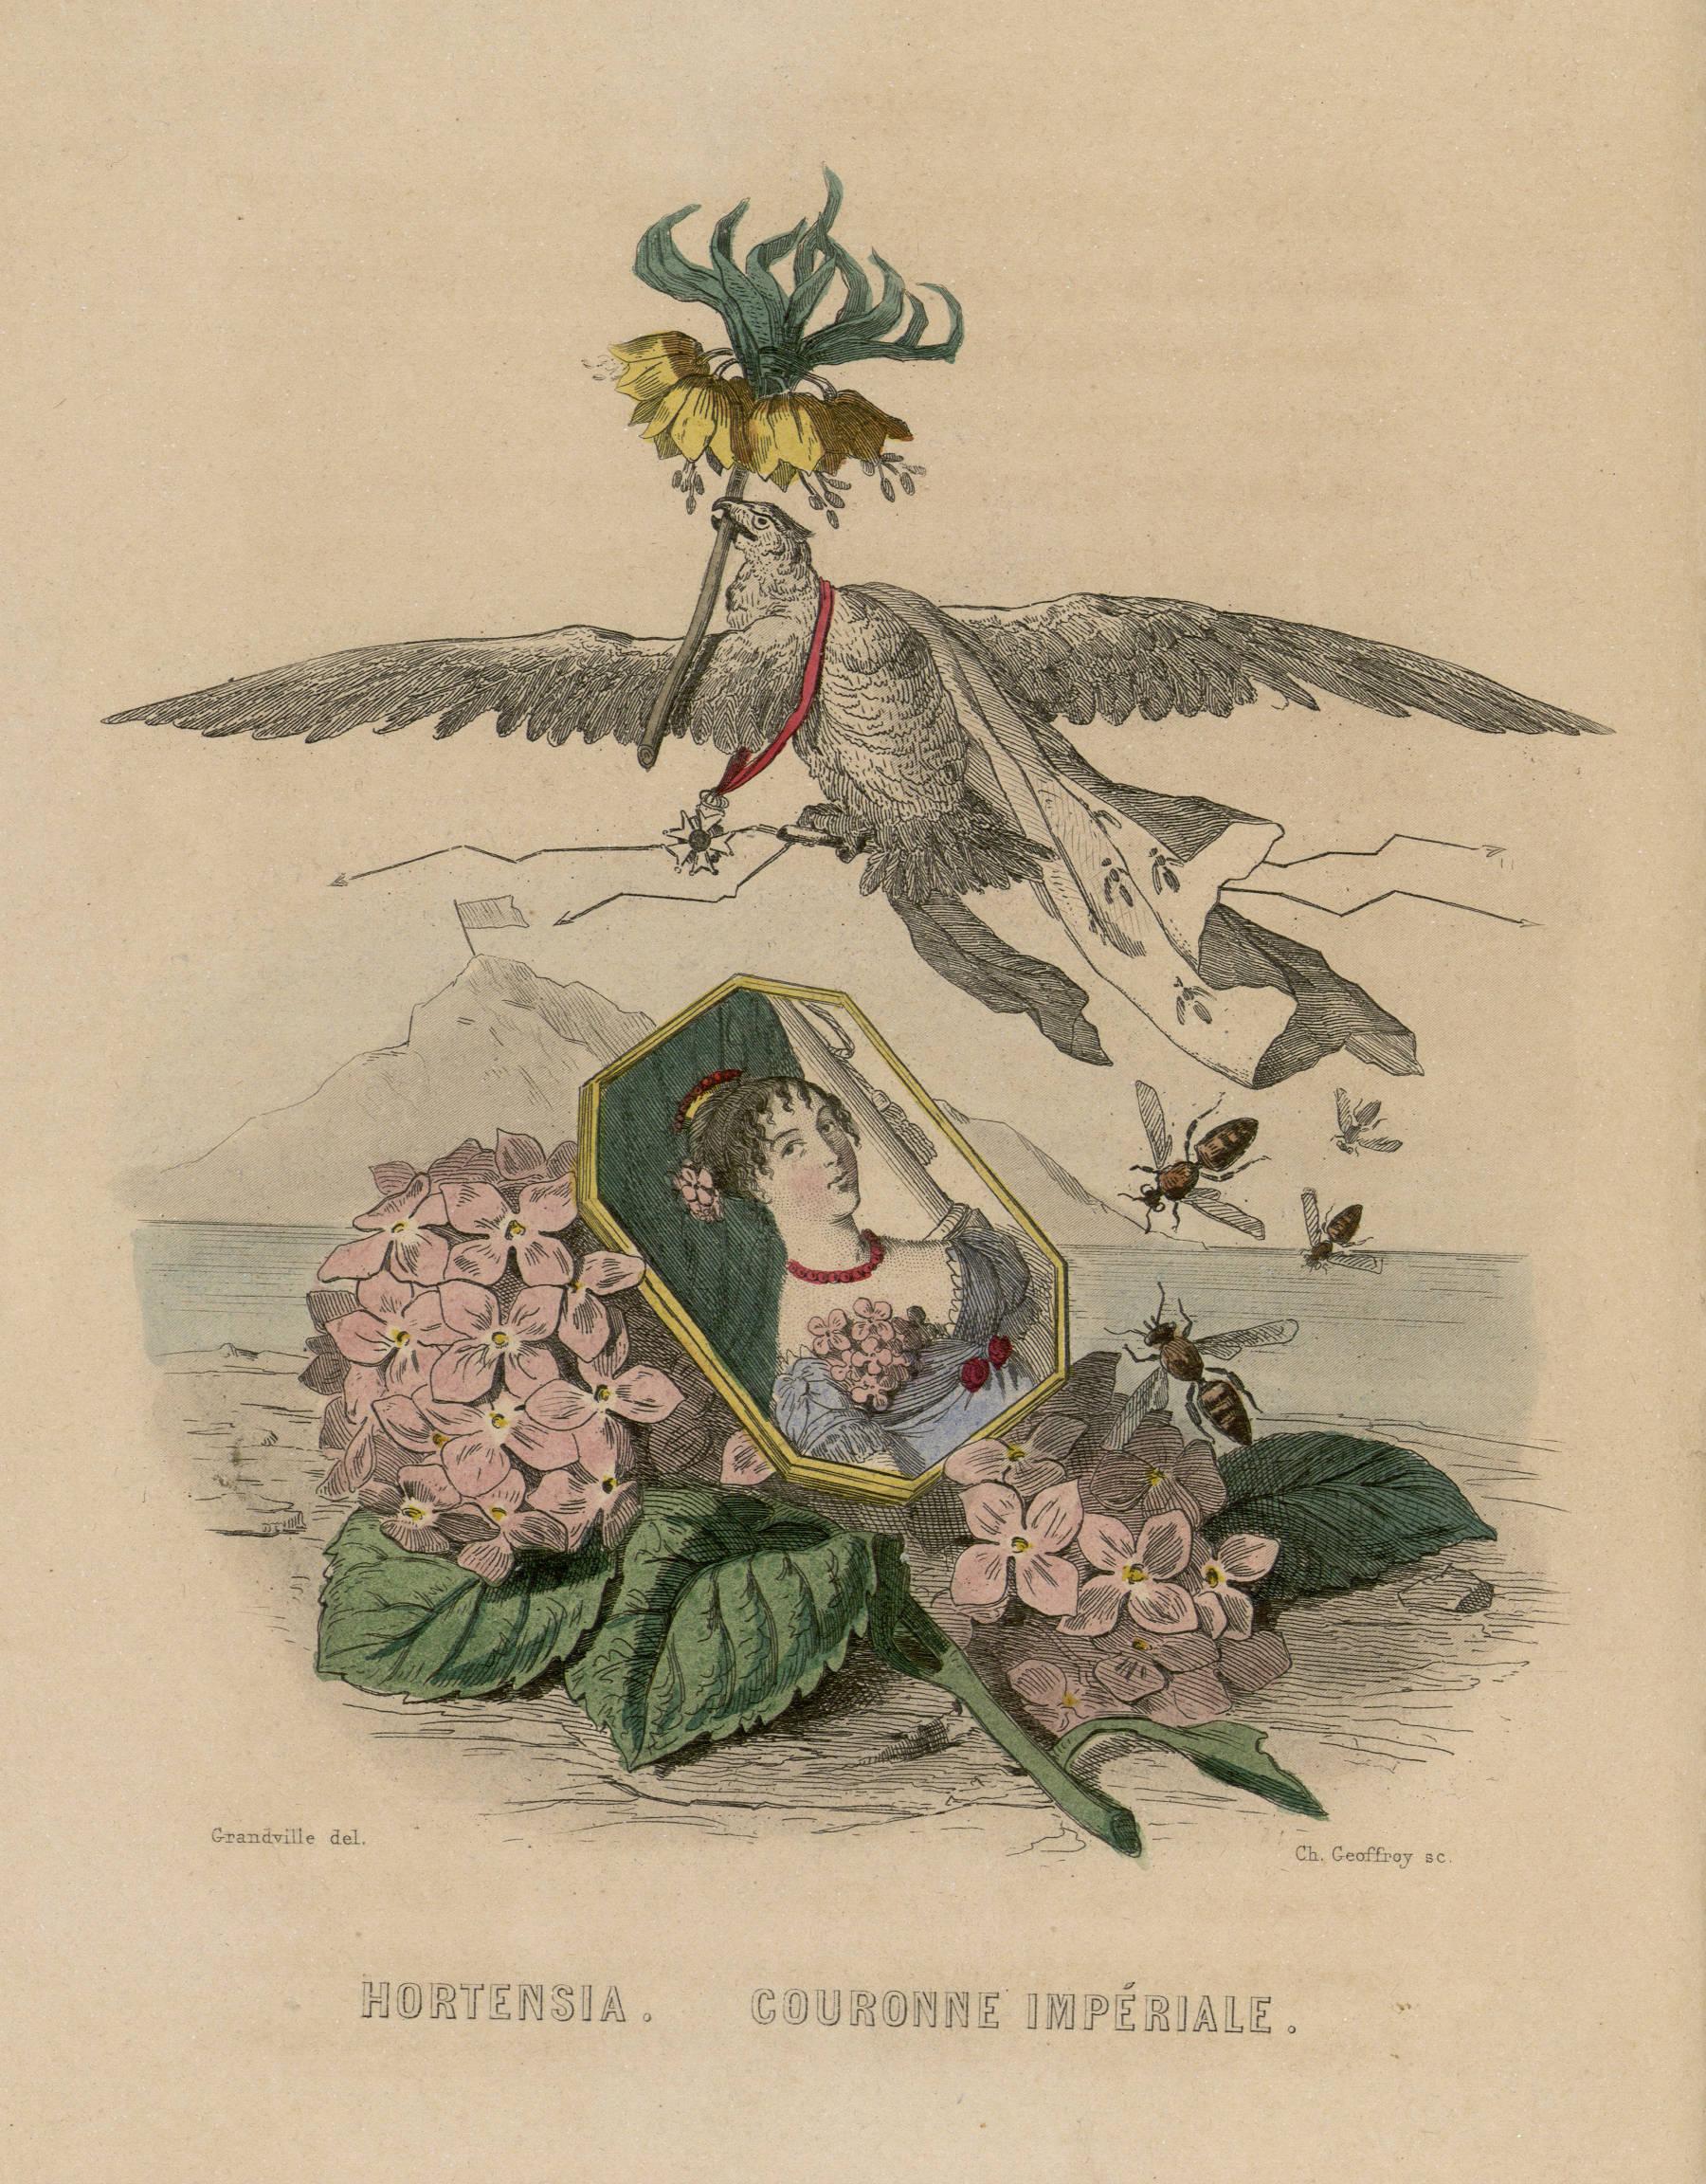 Contenu du Hortensia. Couronne impériale